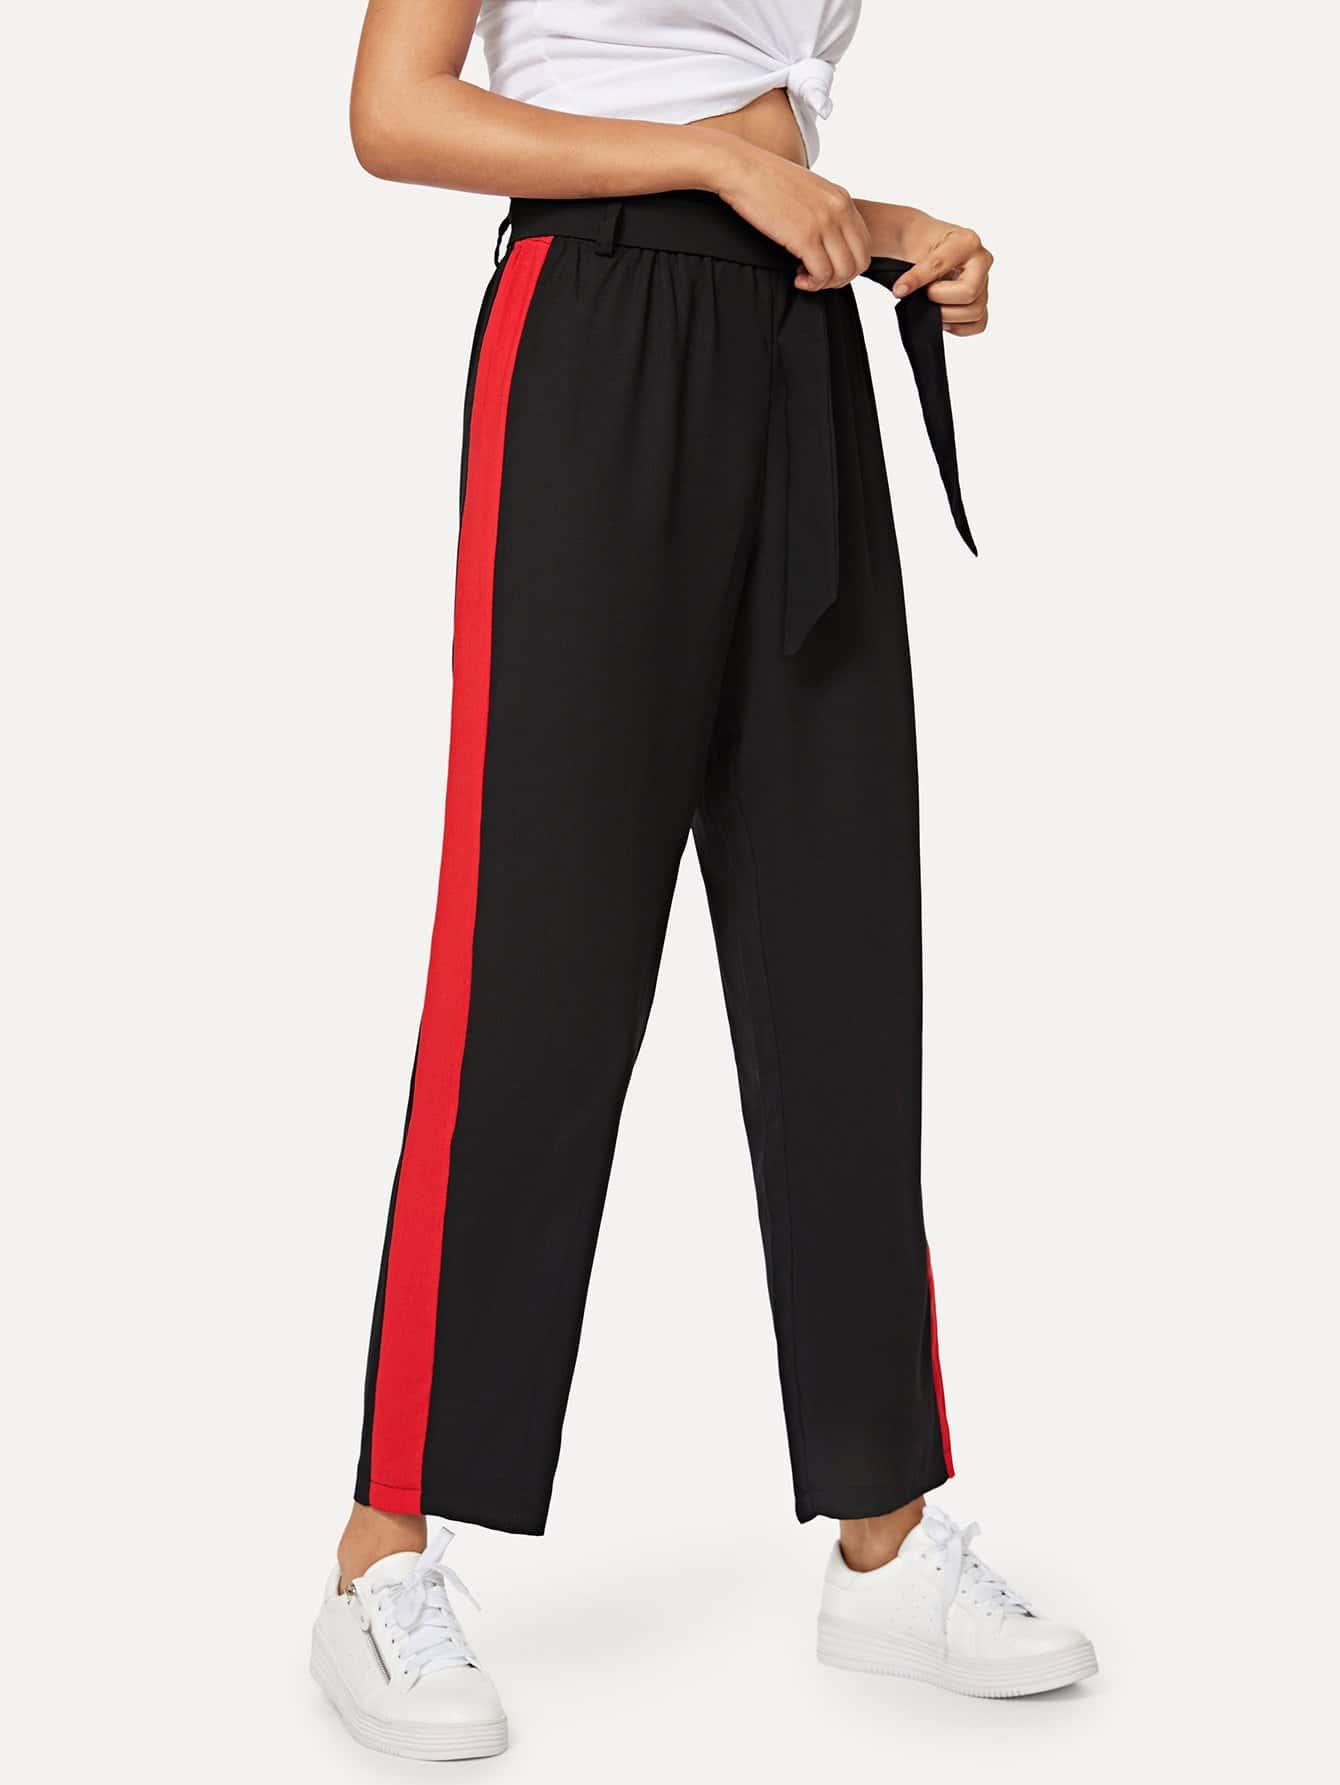 Tie Waist Colorblock Side Pants